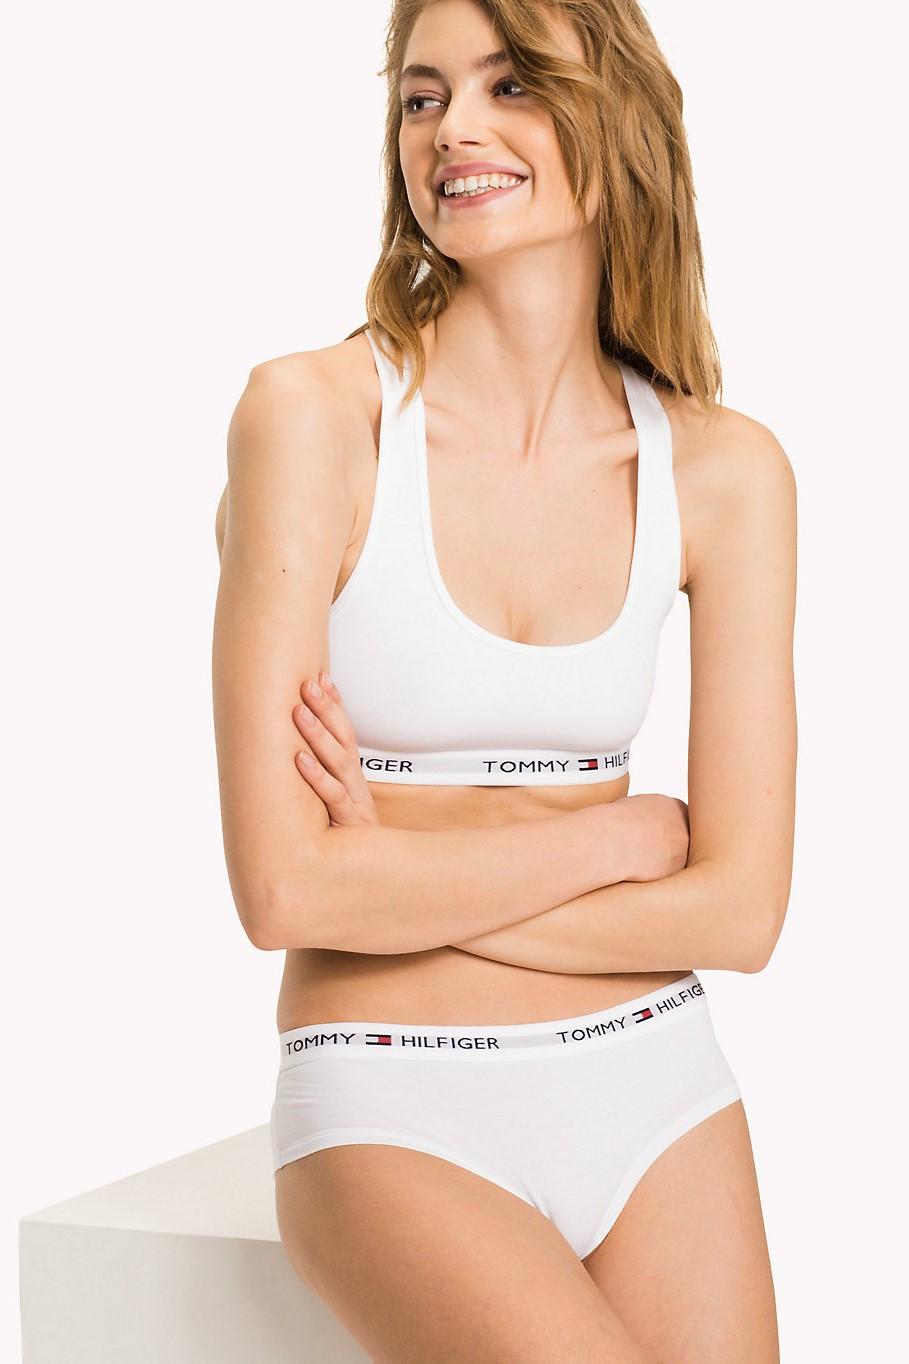 2bc141e1f1b Tommy Hilfiger white sports bra Bralette Iconic - Underwear ...